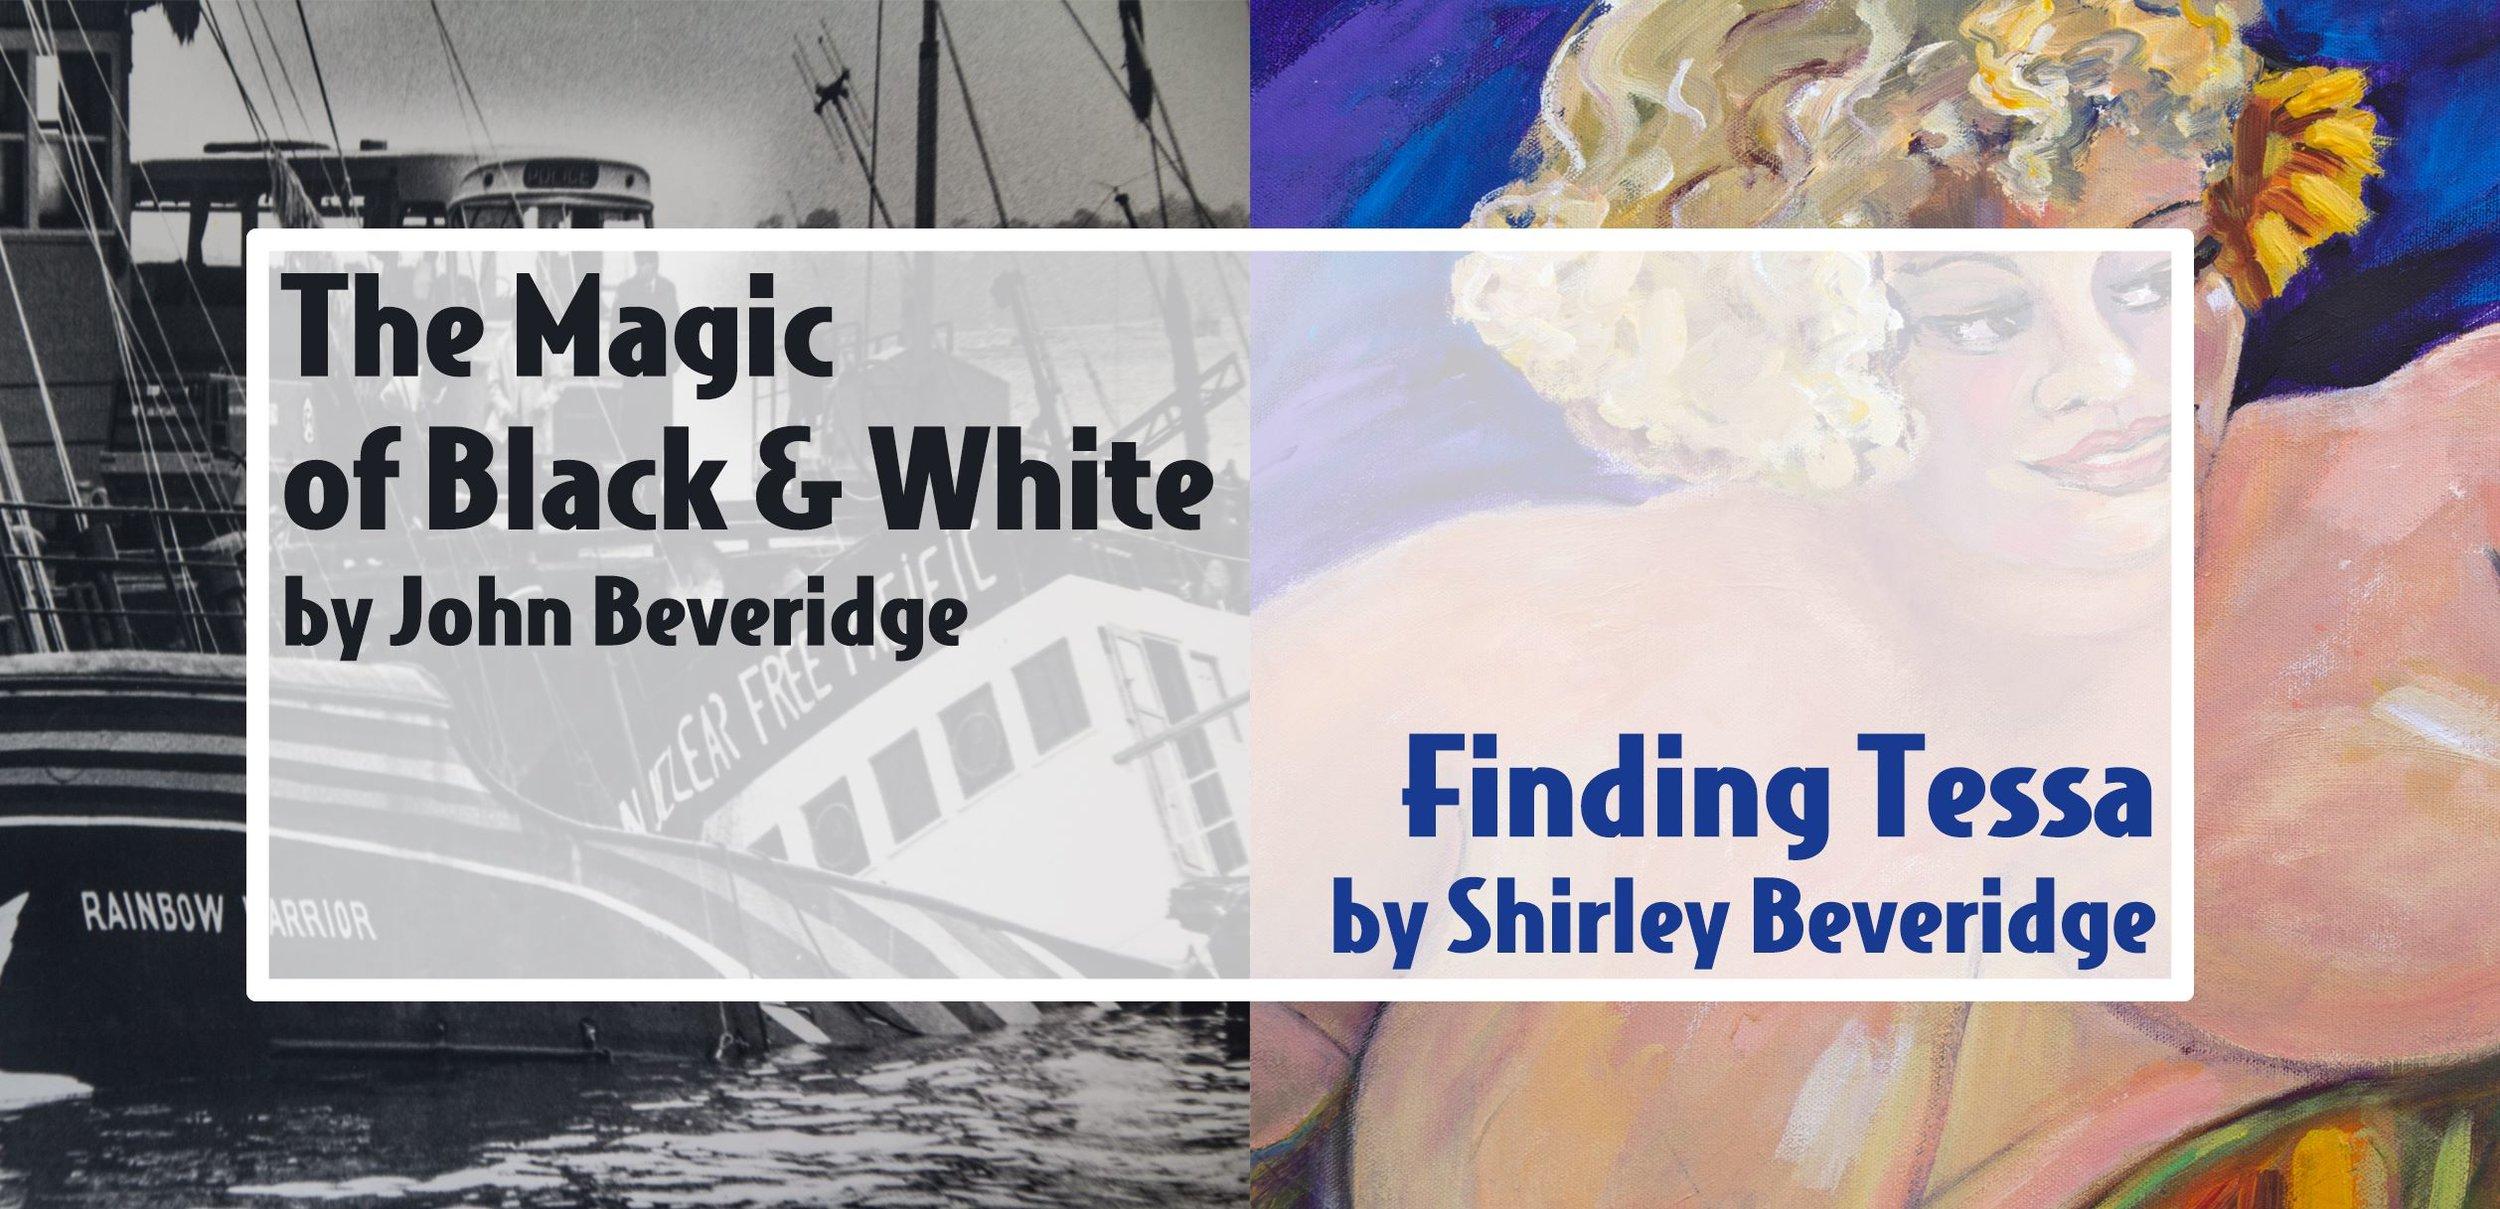 The Magic of Black + White by John Beveridge with Finding Tessa by Shirley Beveridge